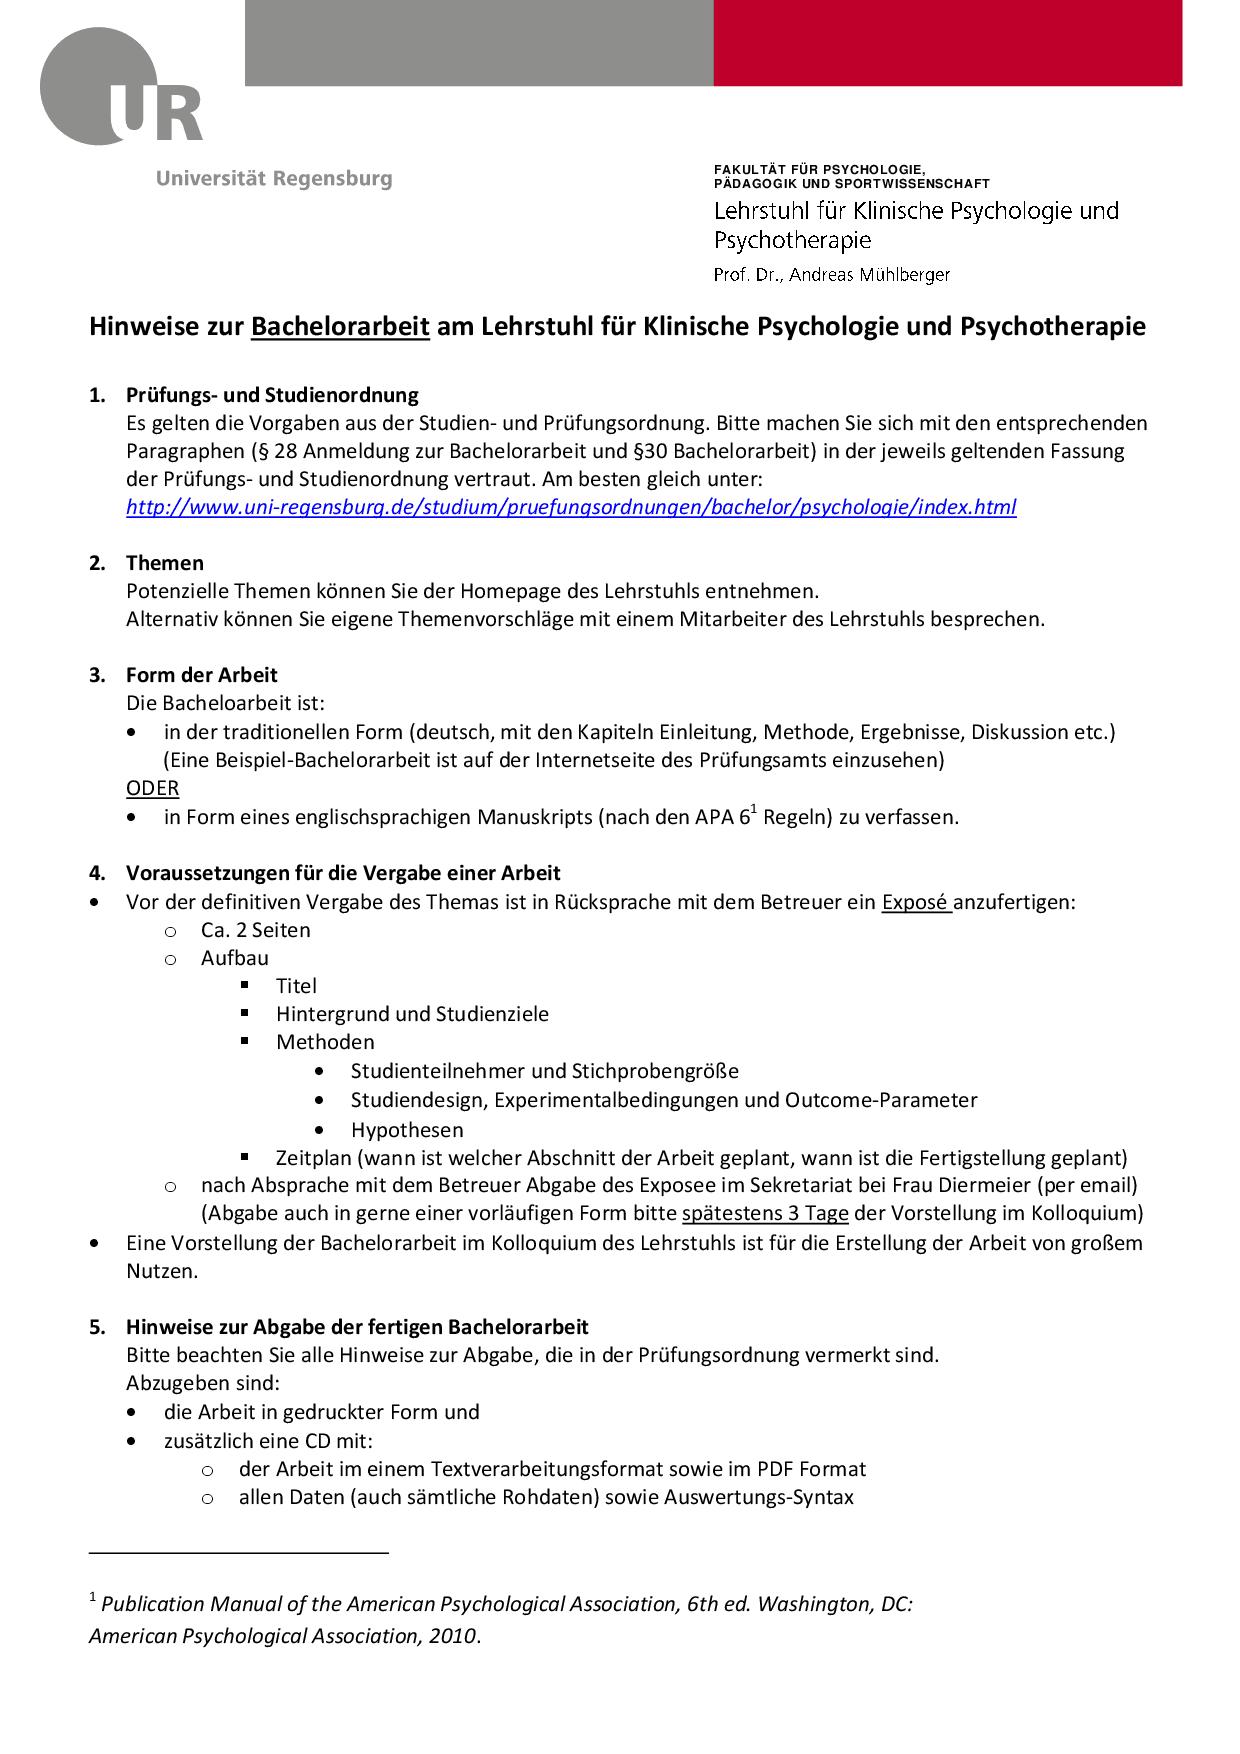 Hinweise Bachelorarbeit Klinische Psychologie Psychotherapie Uni Regensburg Docsity